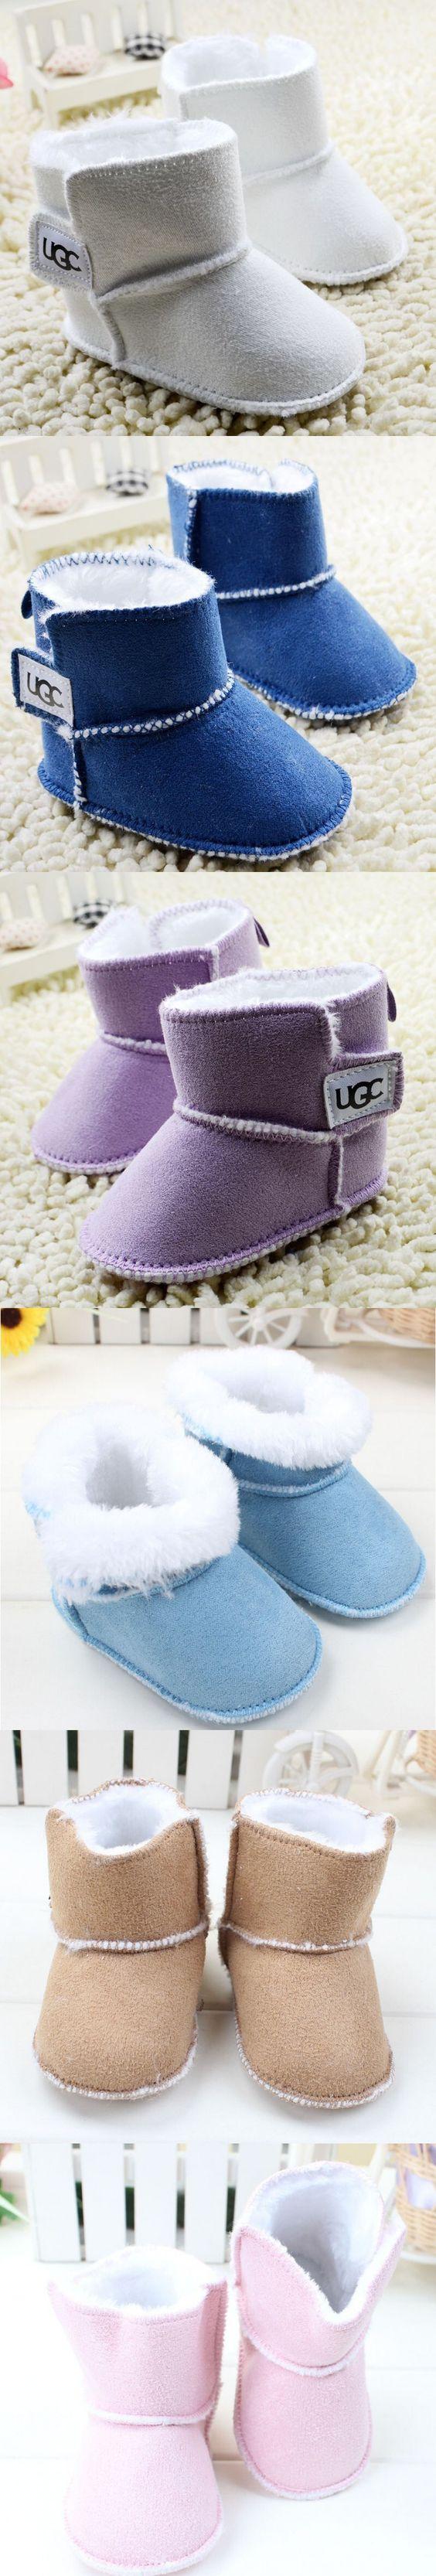 Baby shoes schoentjes schoenen kids 2016 new baby girls Snow Boot warm first walker scarpe neonata babyschuhe toddler soft shoes